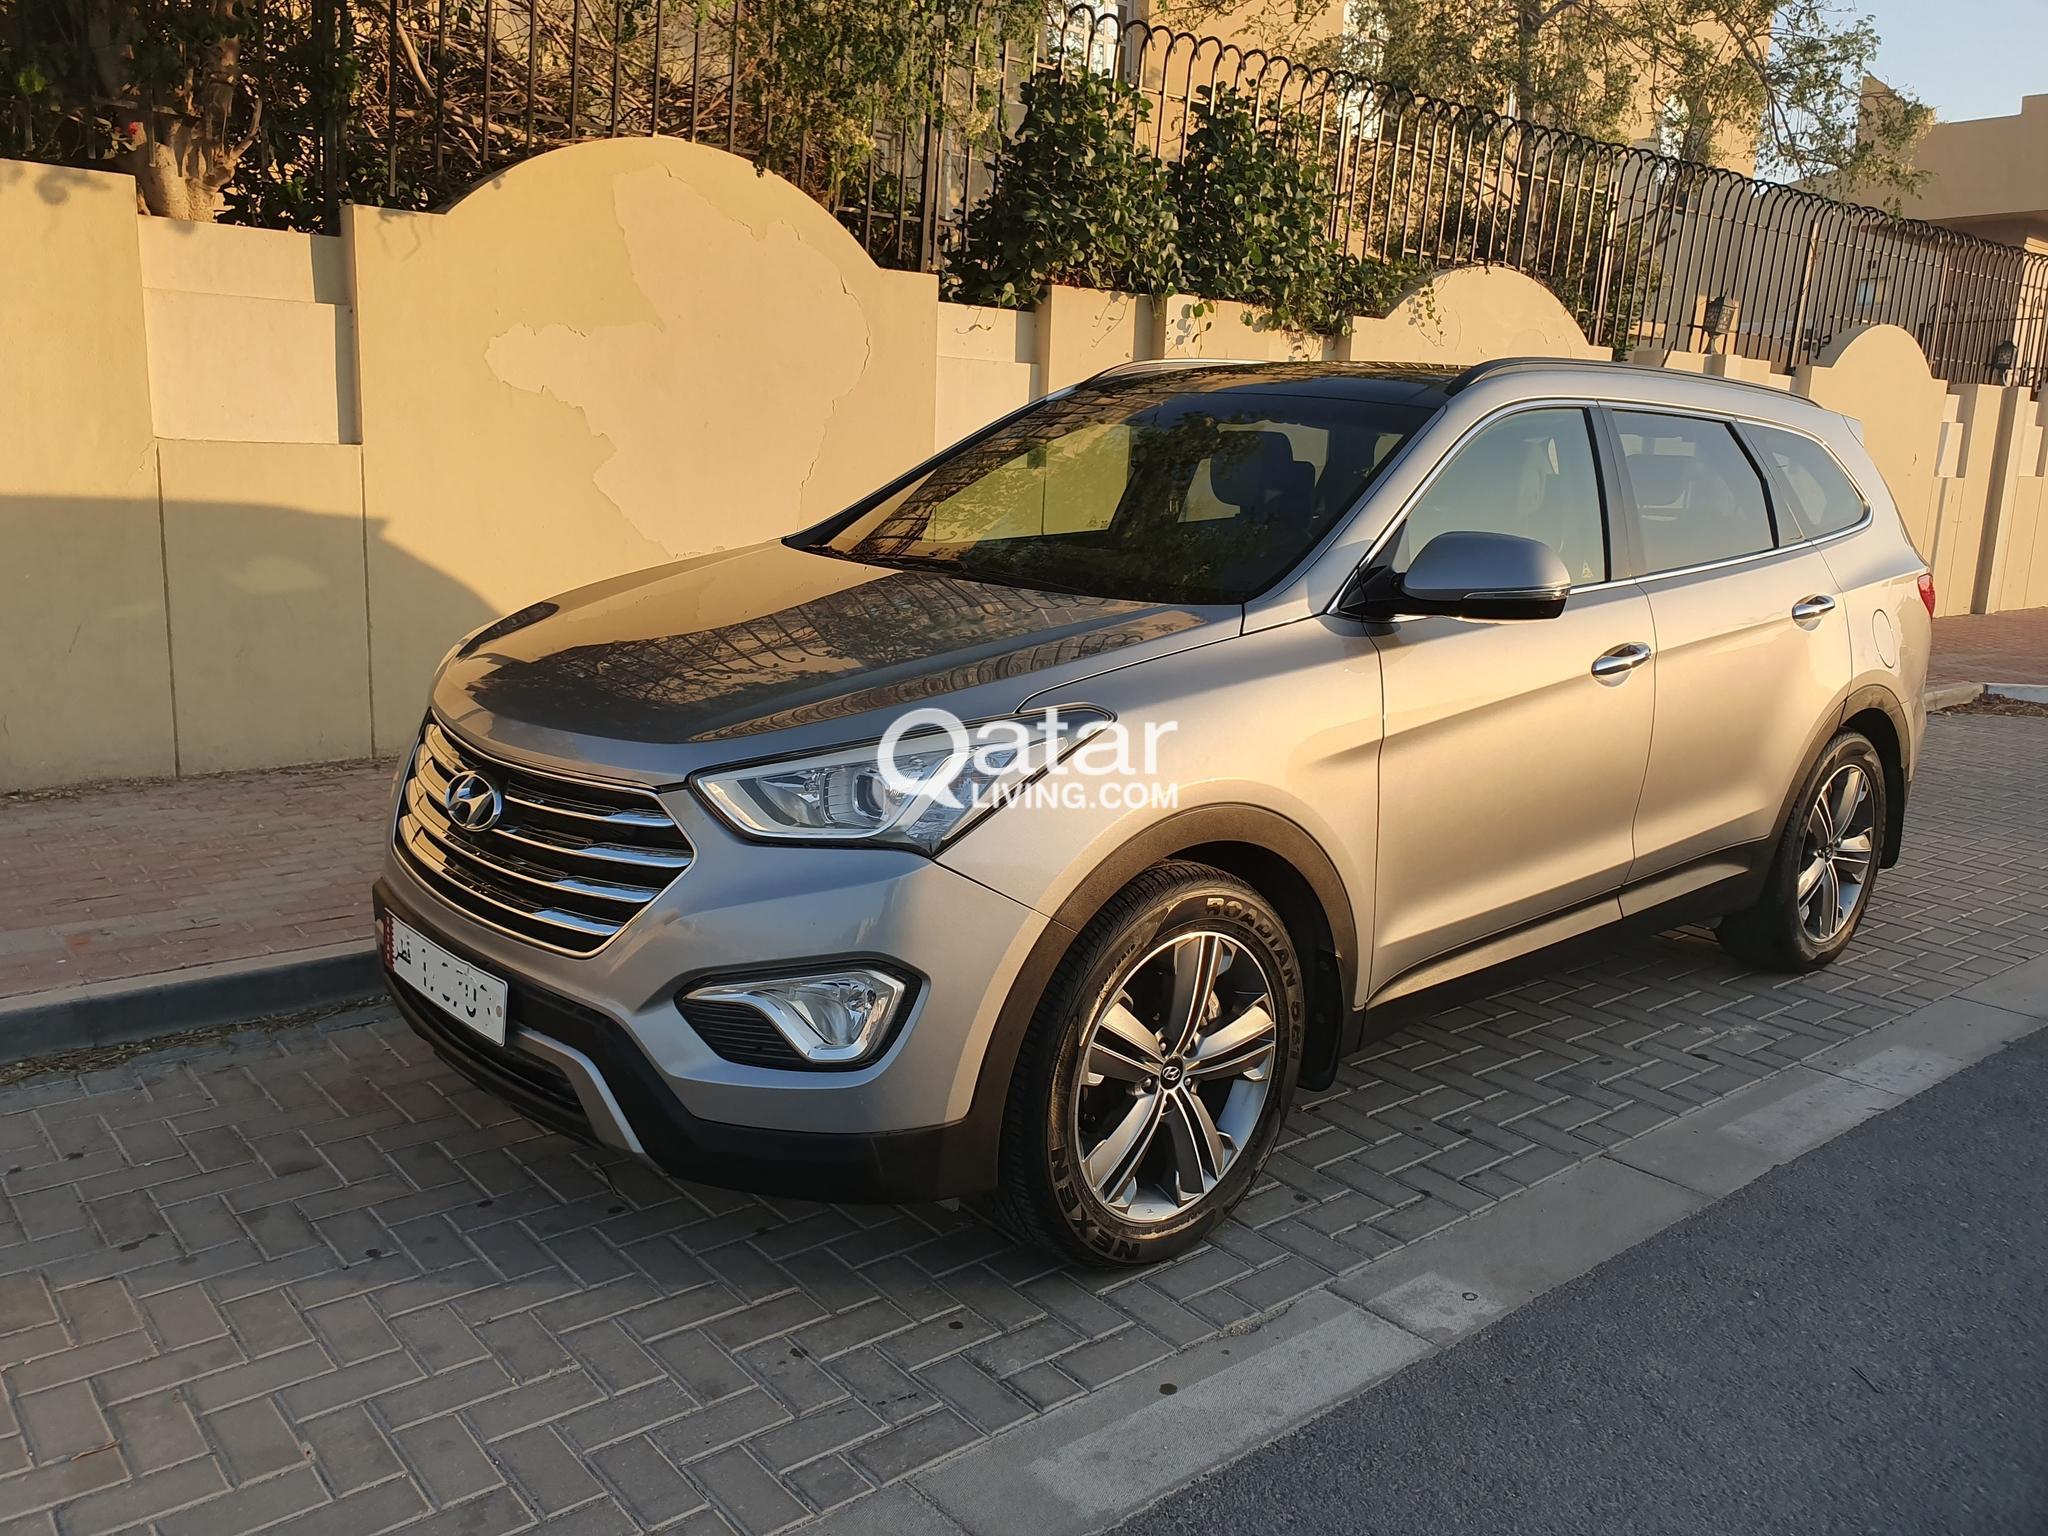 Fully Loaded Grand Santa Fe Lady Driver Qatar Living